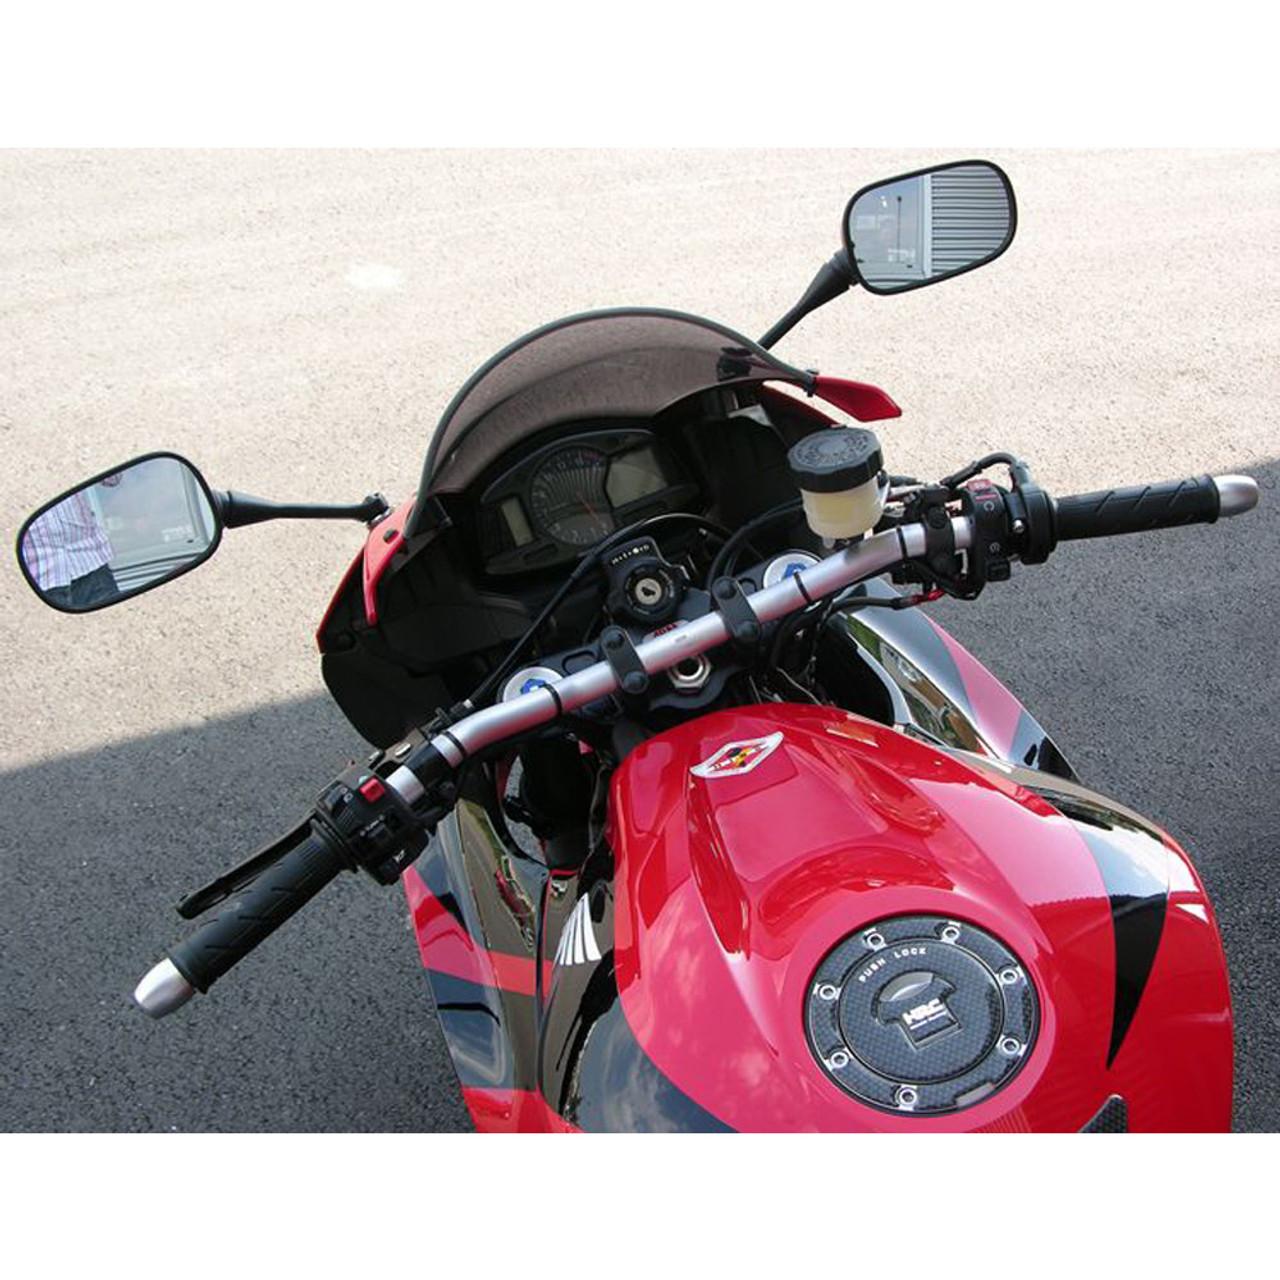 ABM Honda CBR600RR ABS 09-12 Handlebar Riser Kit